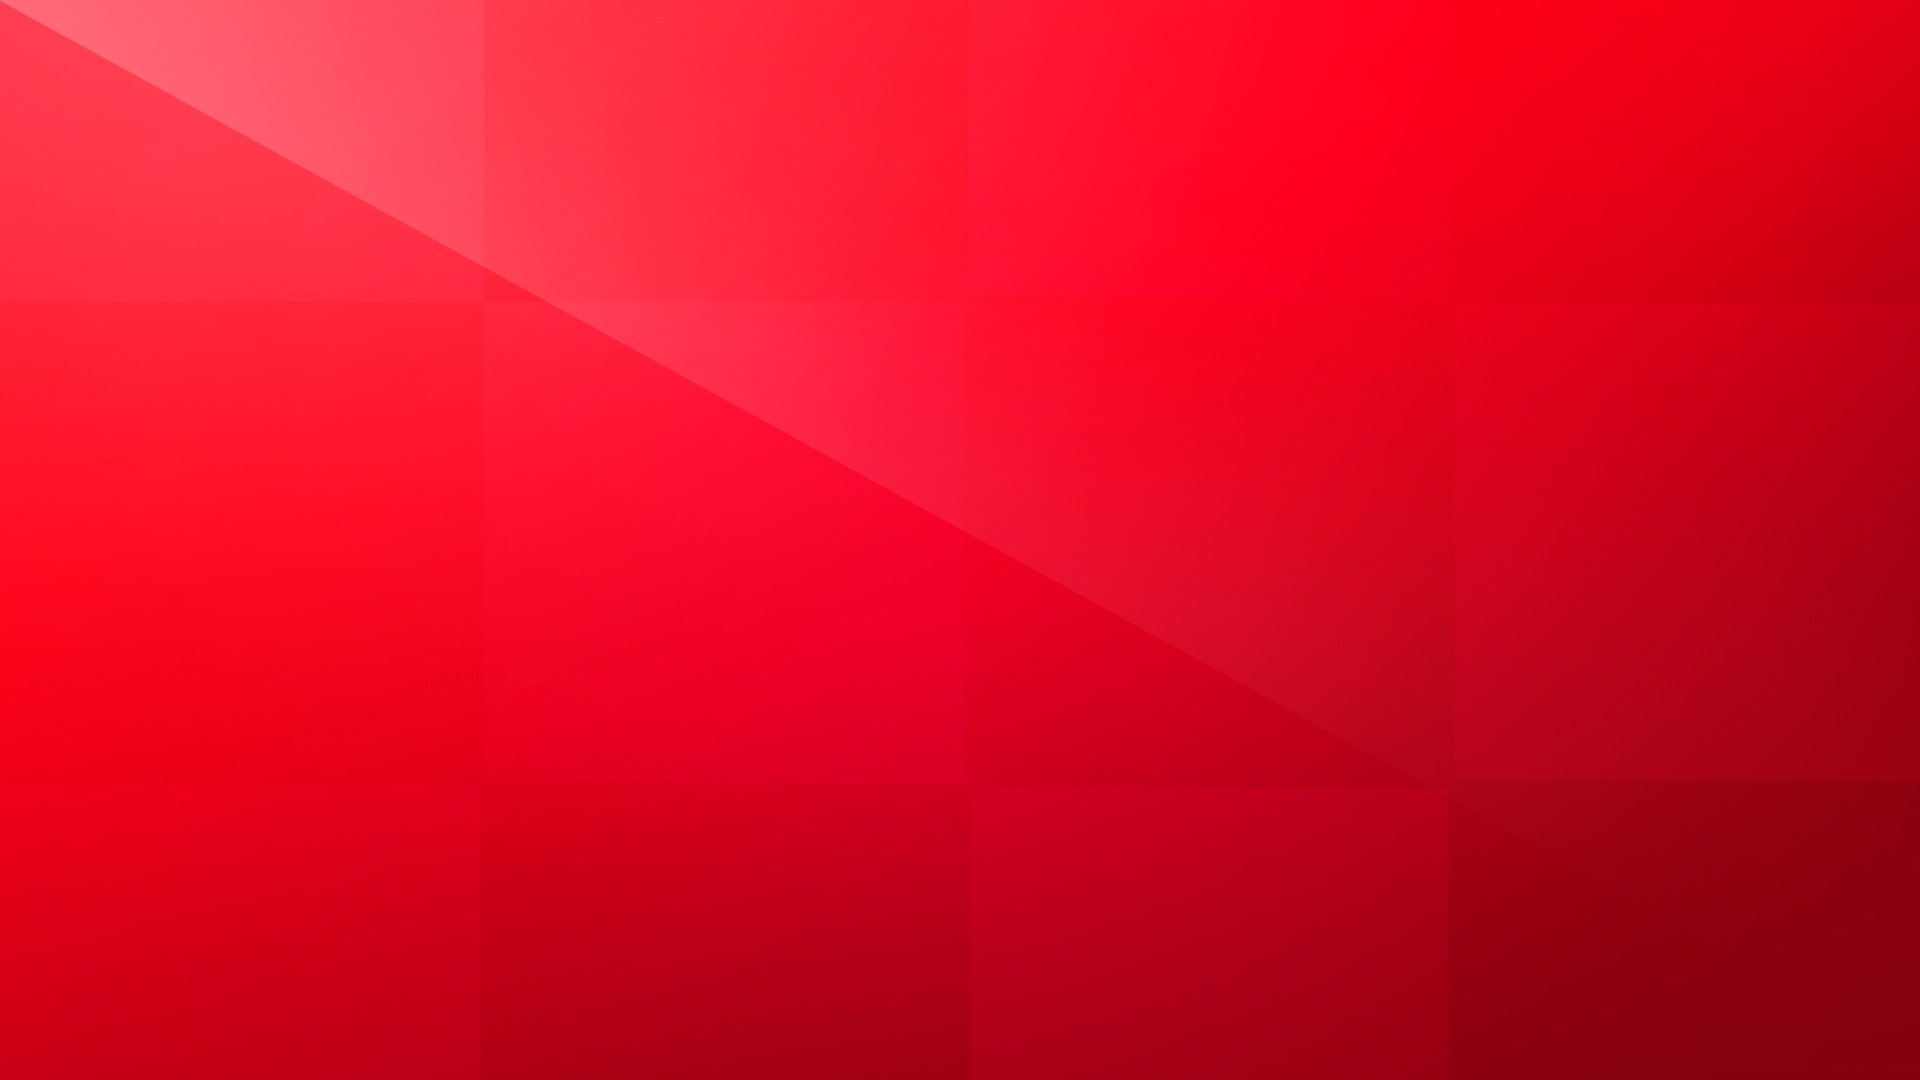 Red Wallpaper for Desktop (73+ pictures)